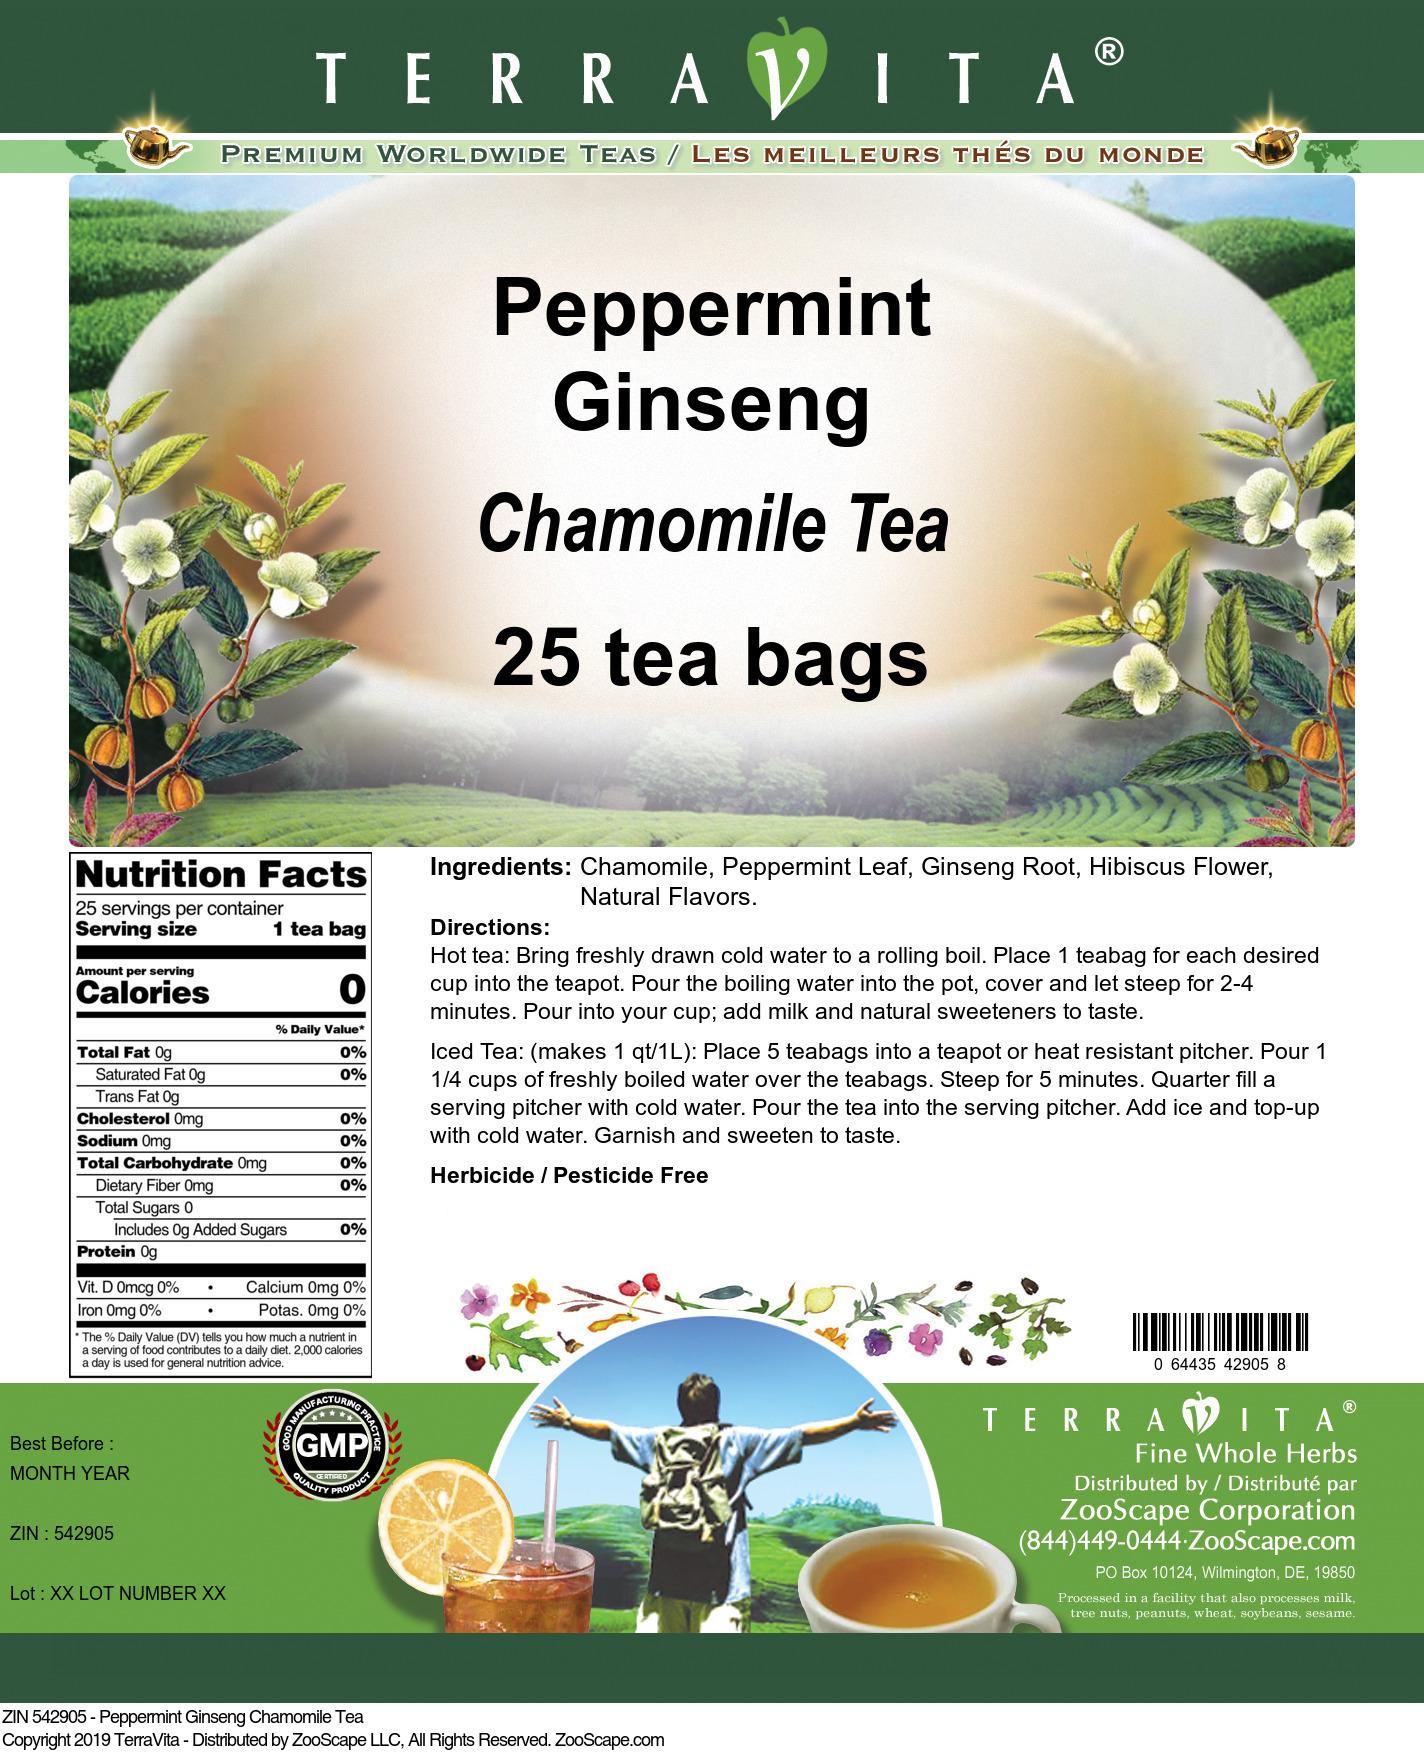 Peppermint Ginseng Chamomile Tea